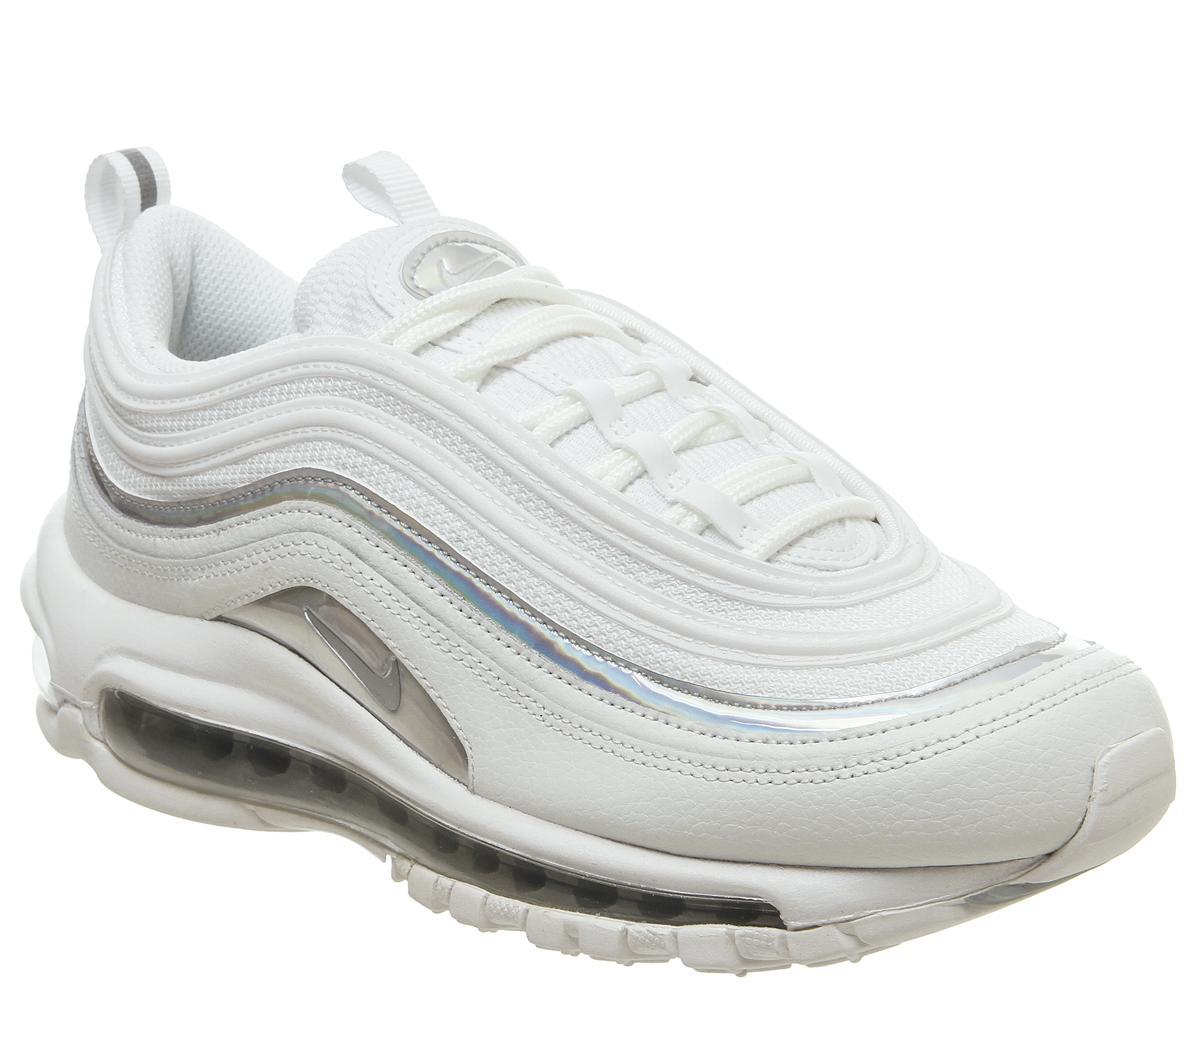 Release Date: Nike Air Max 97 White Metallic Silver